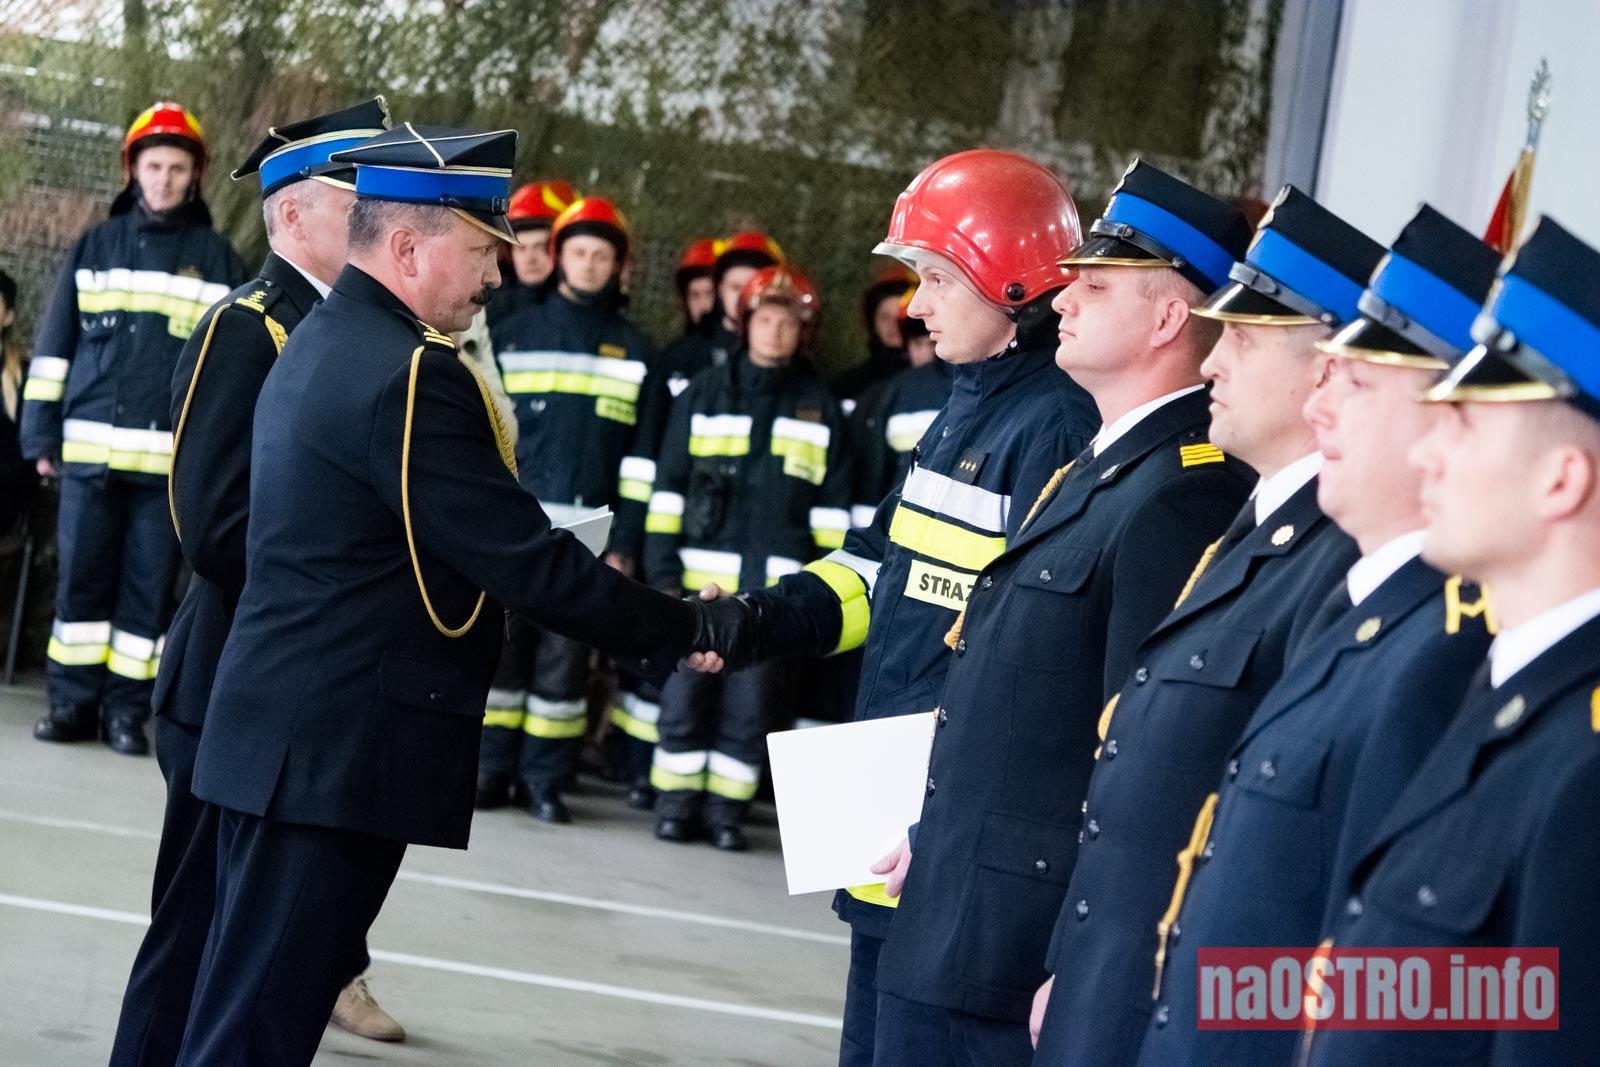 NaOSTRO dzień strażaka-18